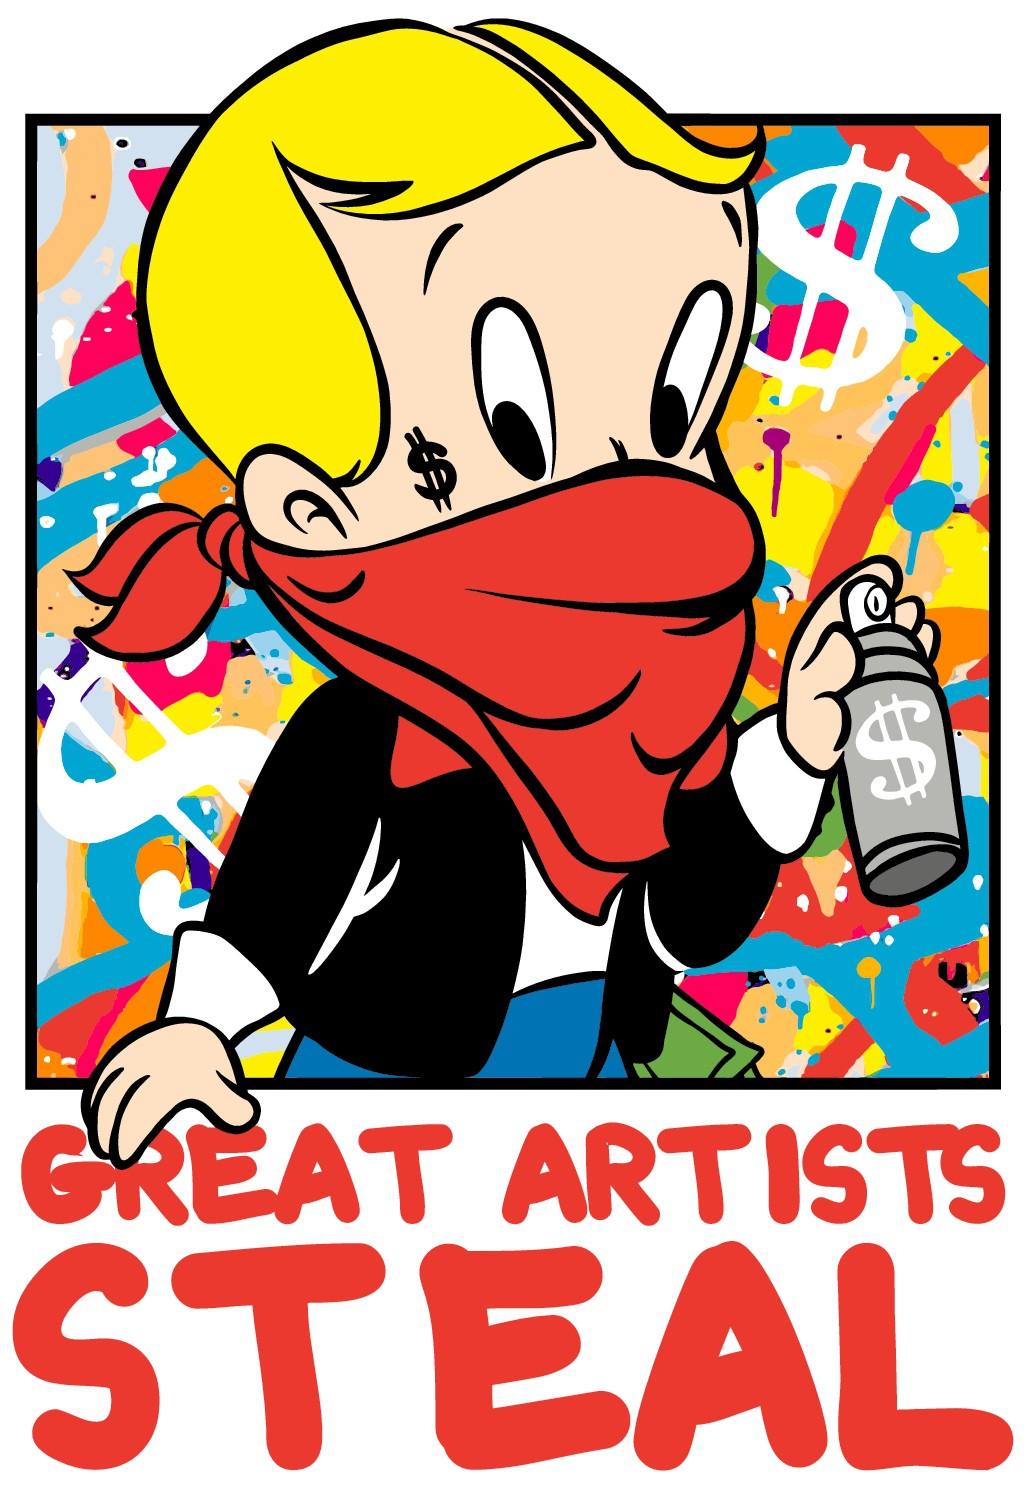 """Good artists copy, Great artists steal."" ~ Shirt Design Contest"